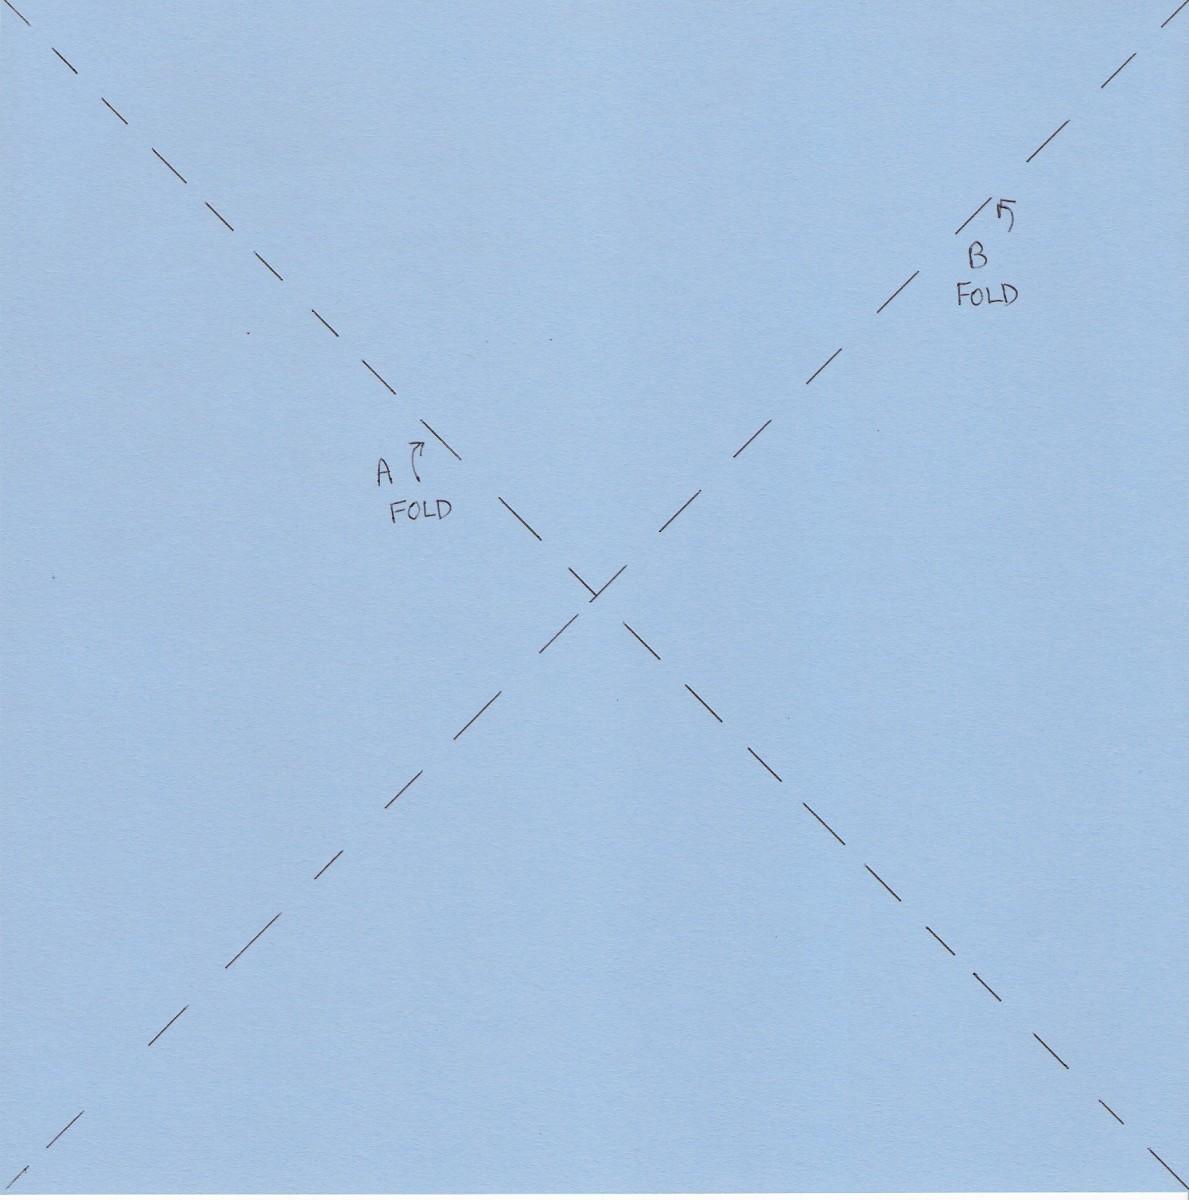 Fold diagonally and unfold along both A and B diagonal lines.